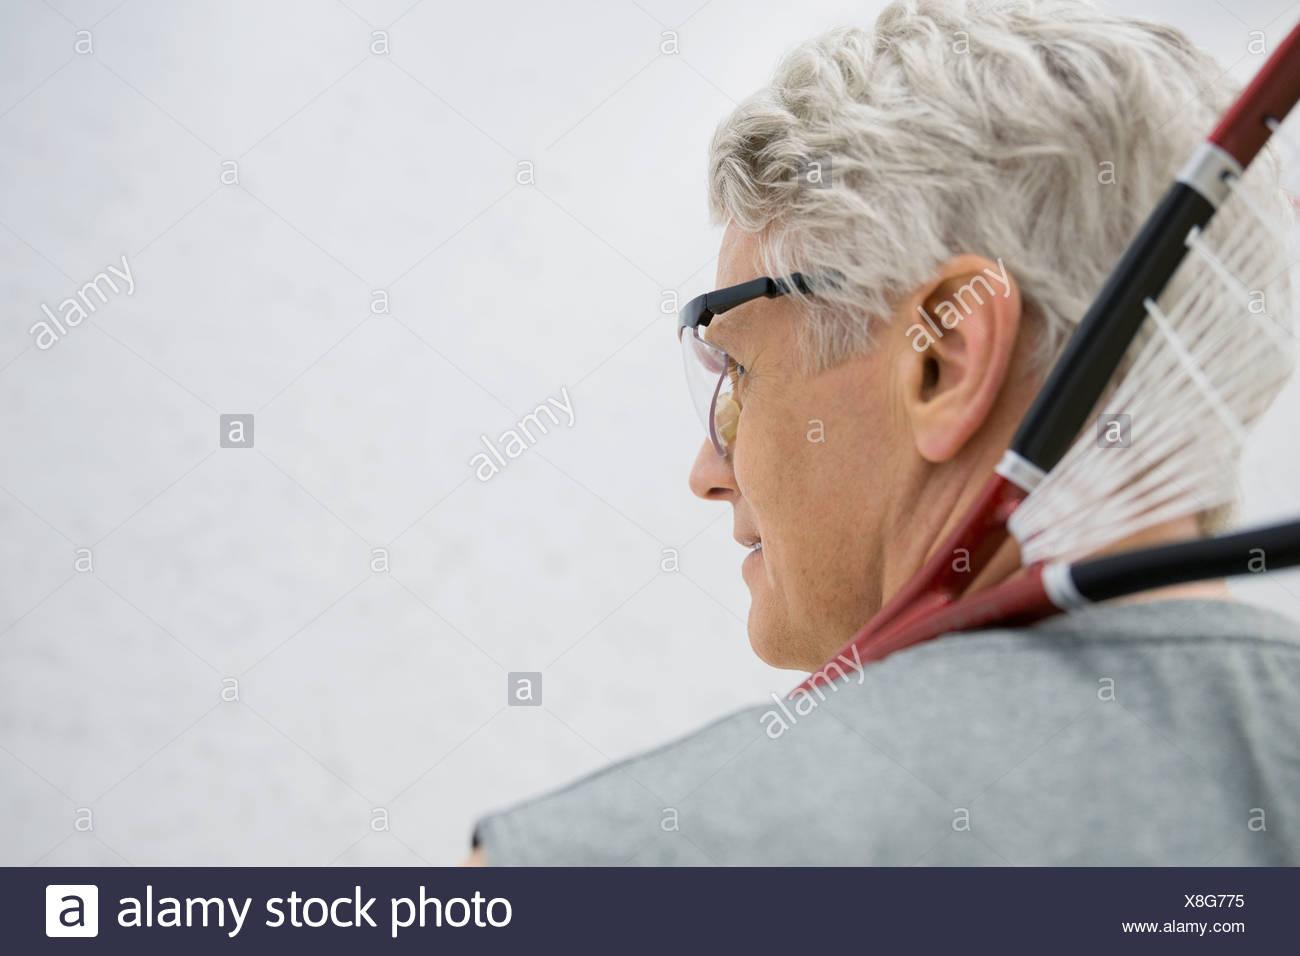 Hombre de gafas celebración squash raqueta Imagen De Stock